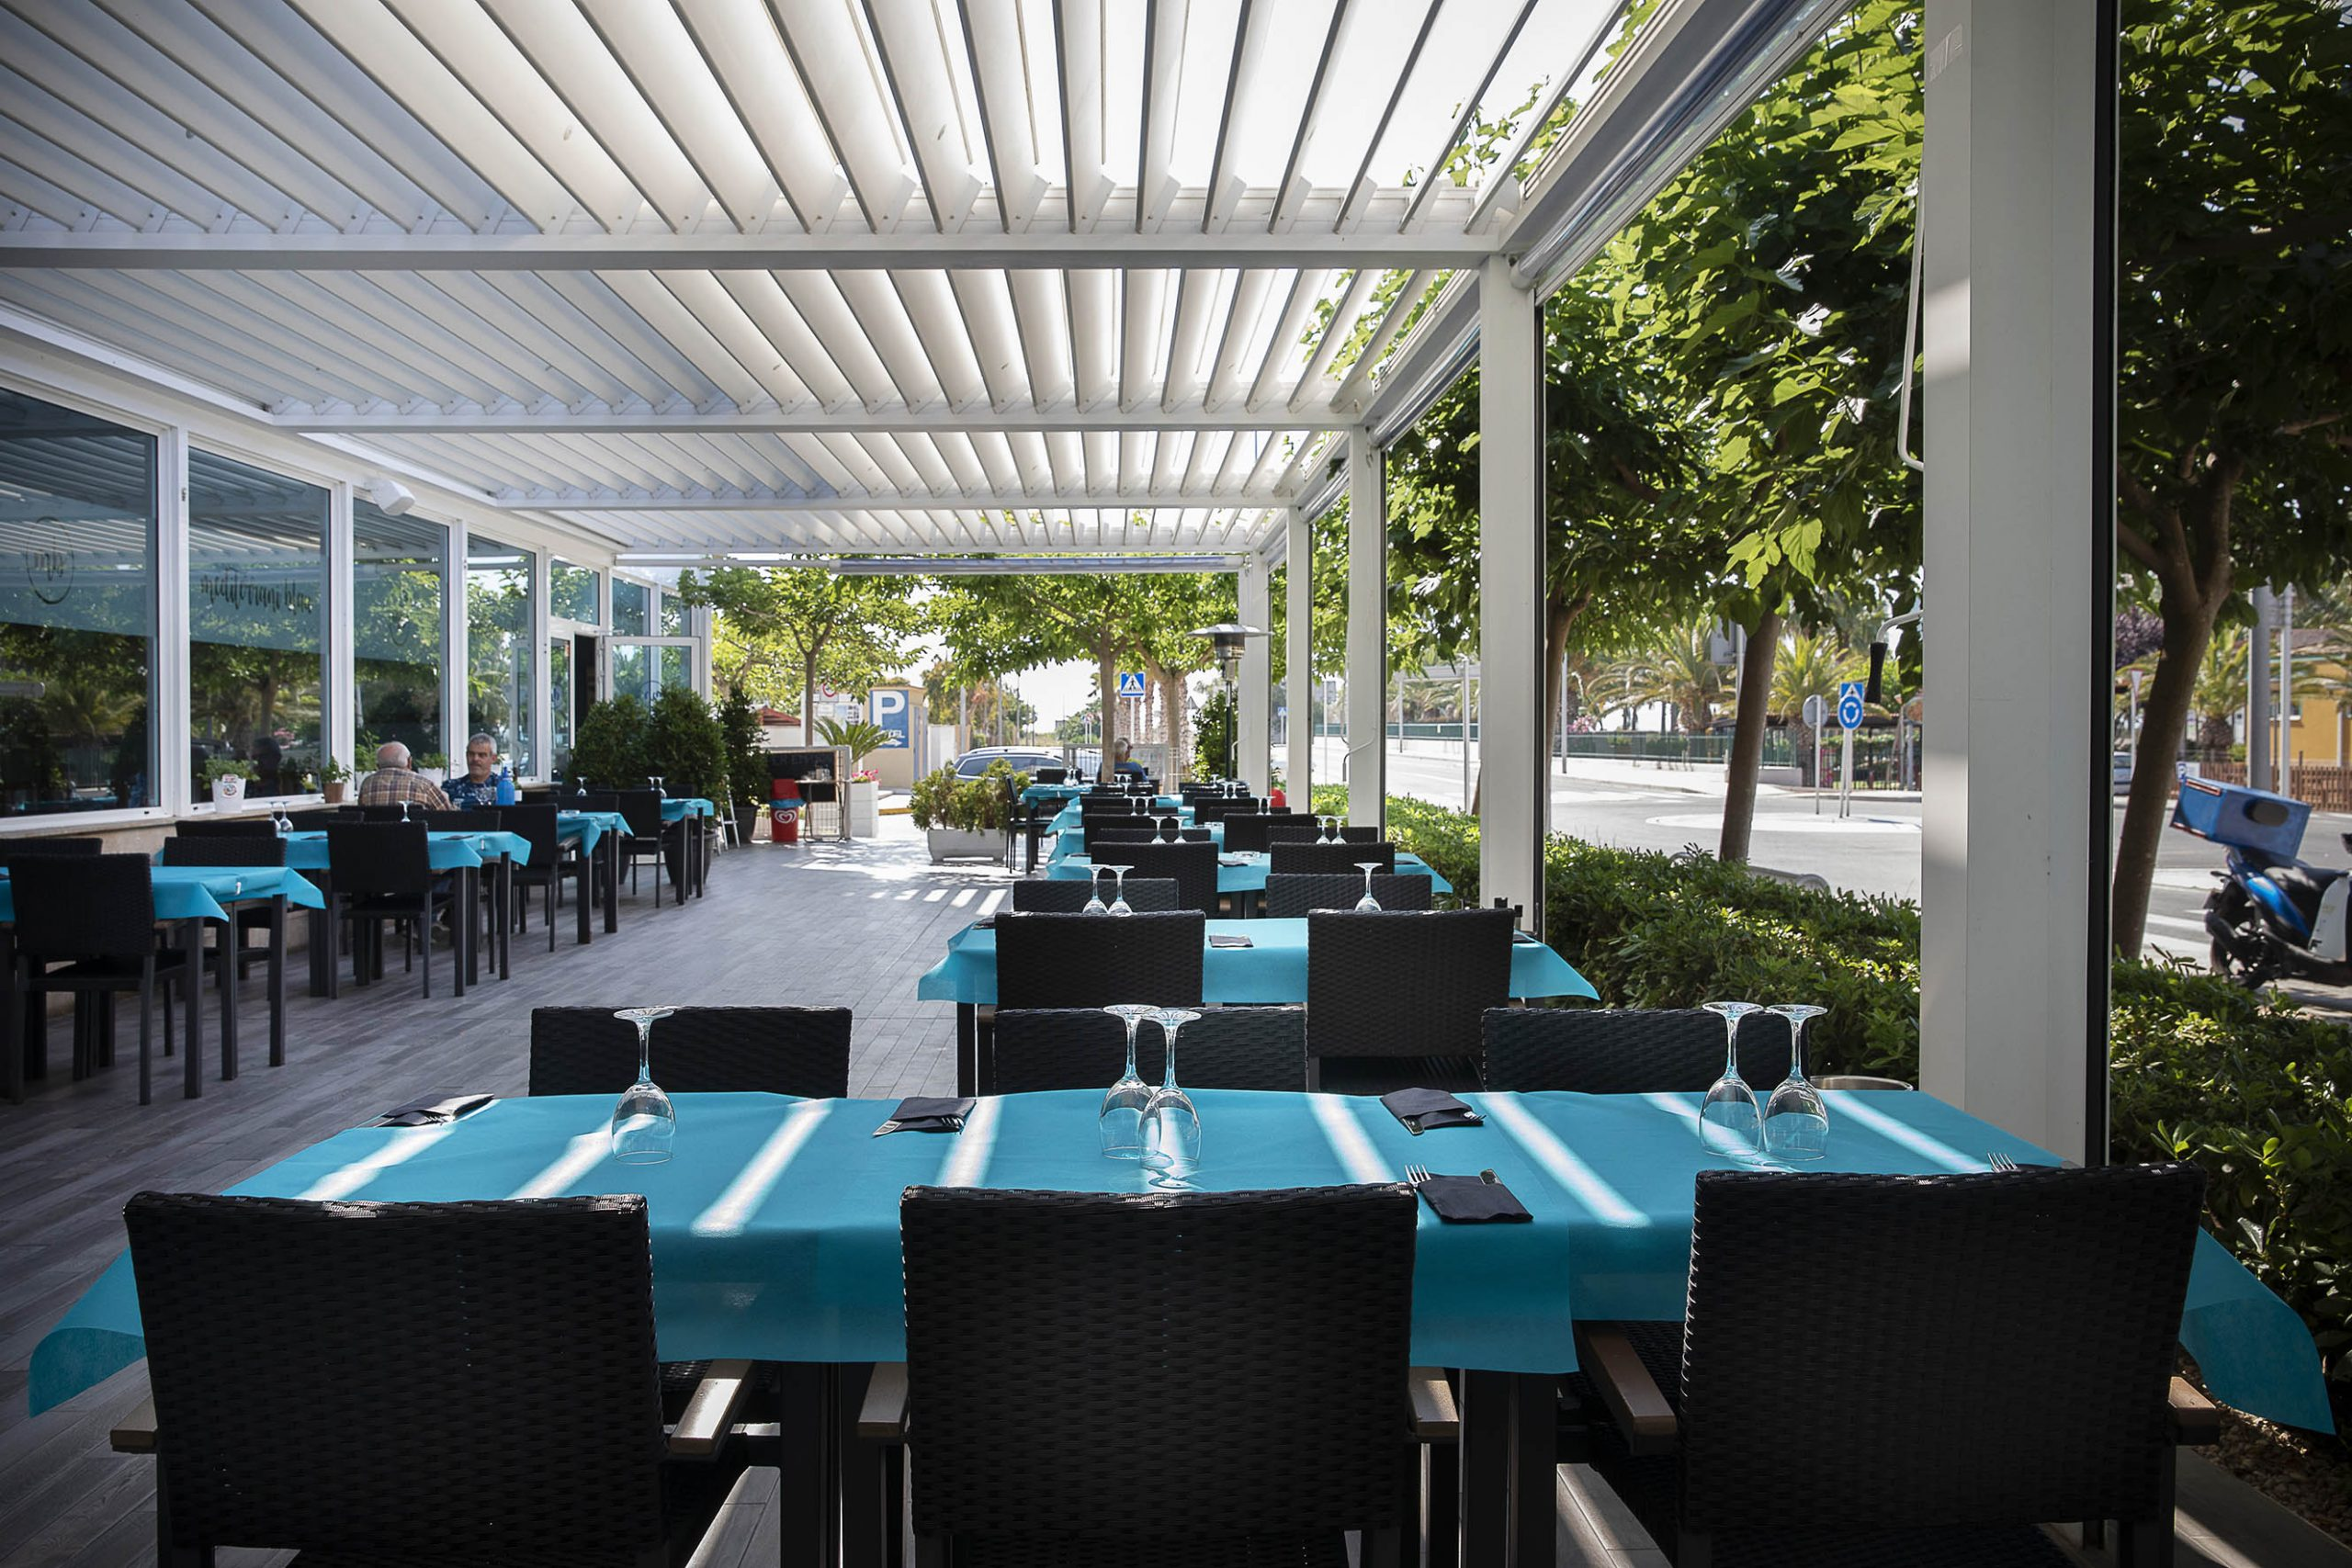 La terrassa del restaurant Mediterrani Blau | Jordi Play